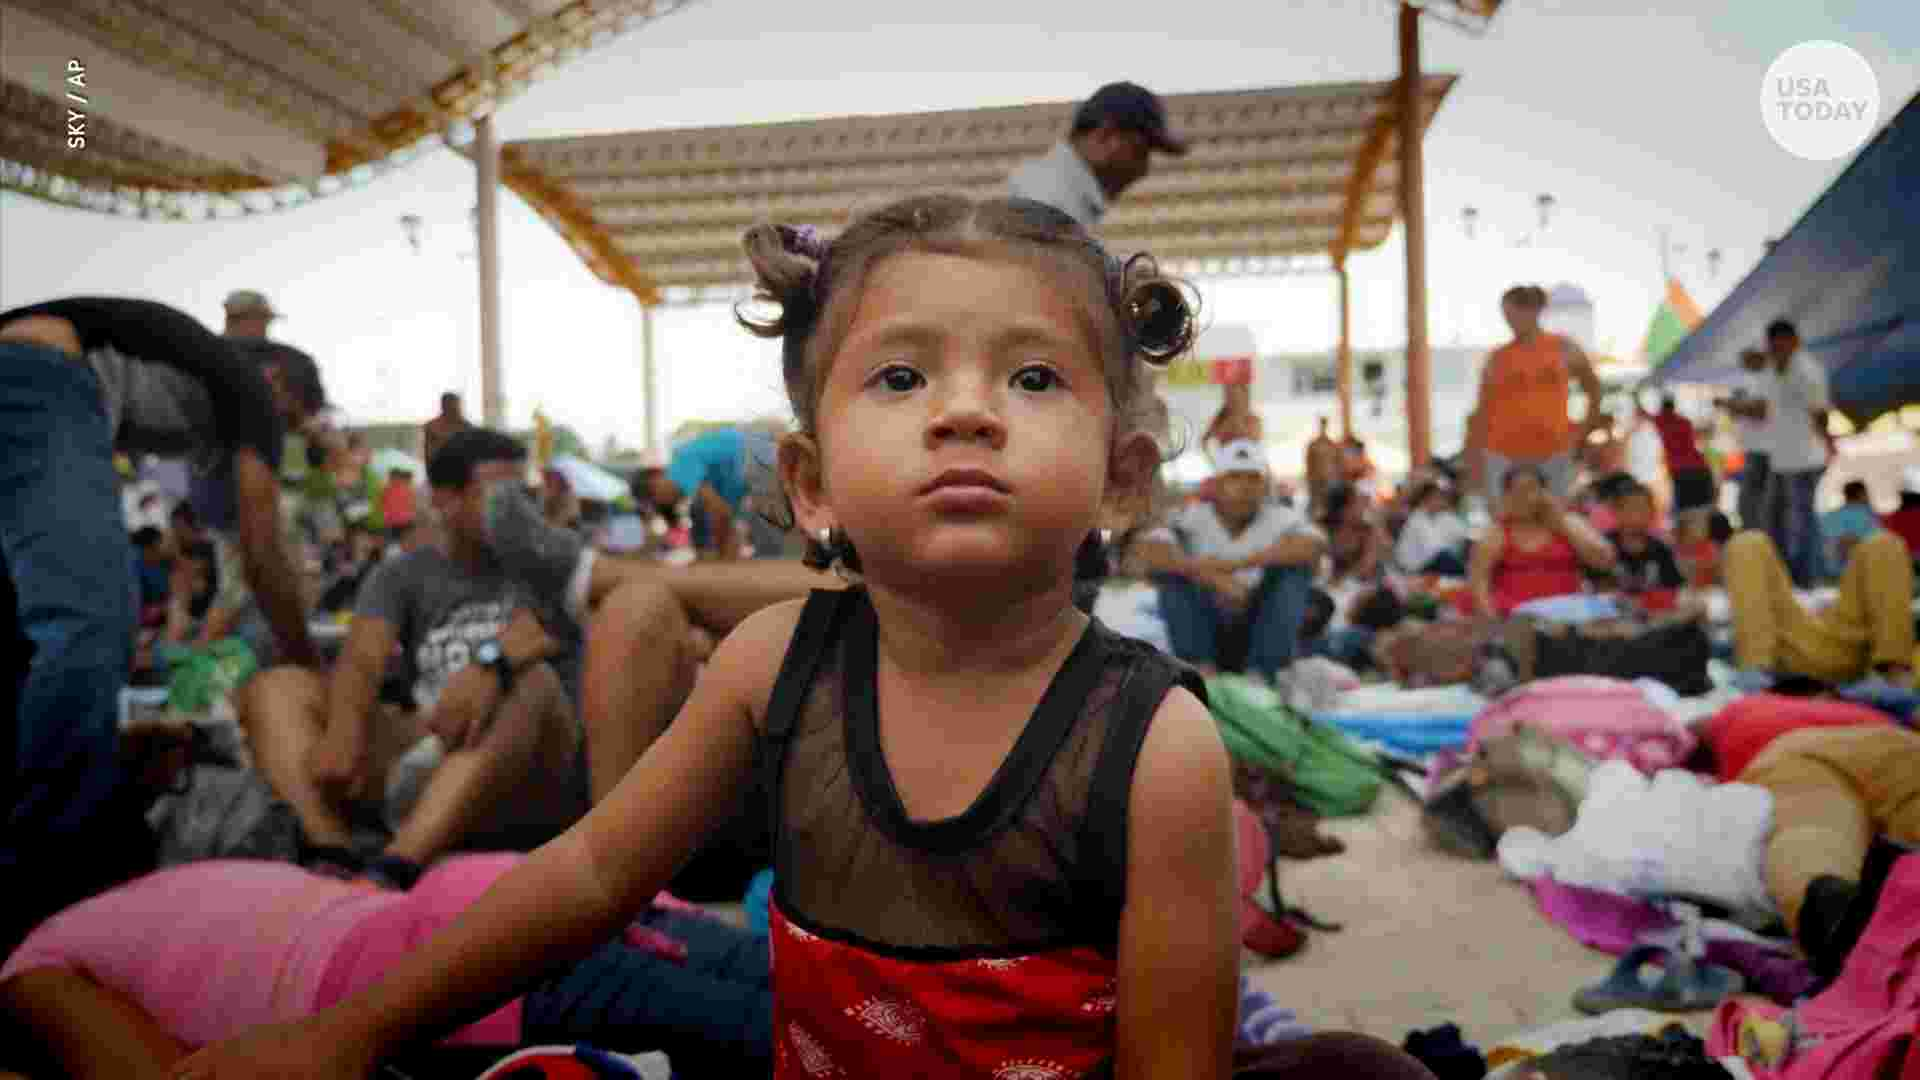 Migrant caravan reaches Chiapas, October 2018.